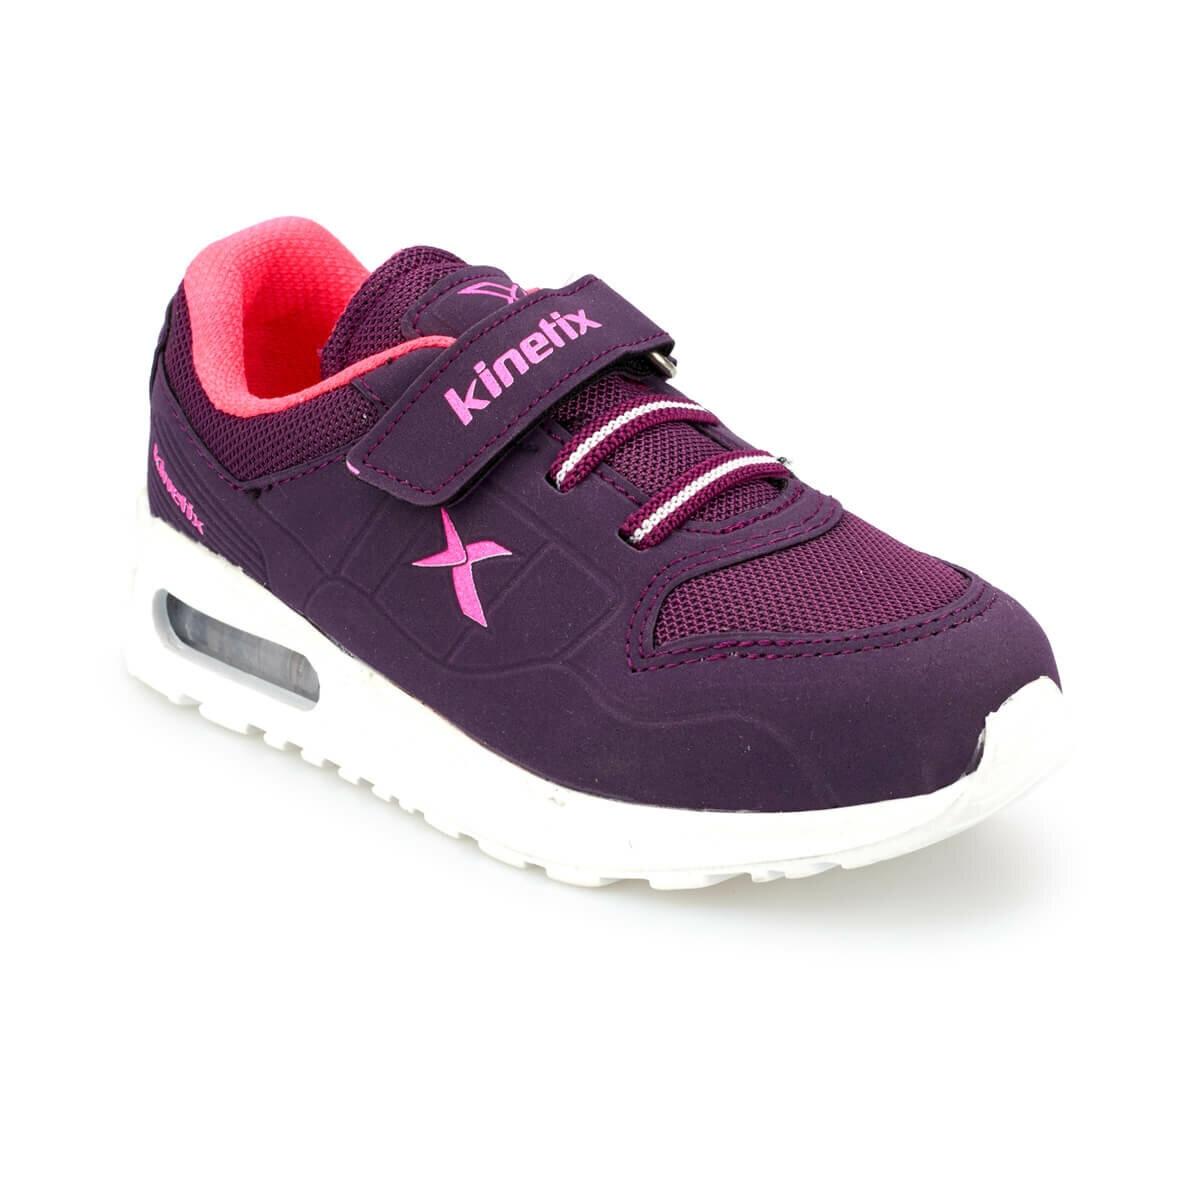 FLO BIRNO Purple Female Child Sneaker Shoes KINETIX